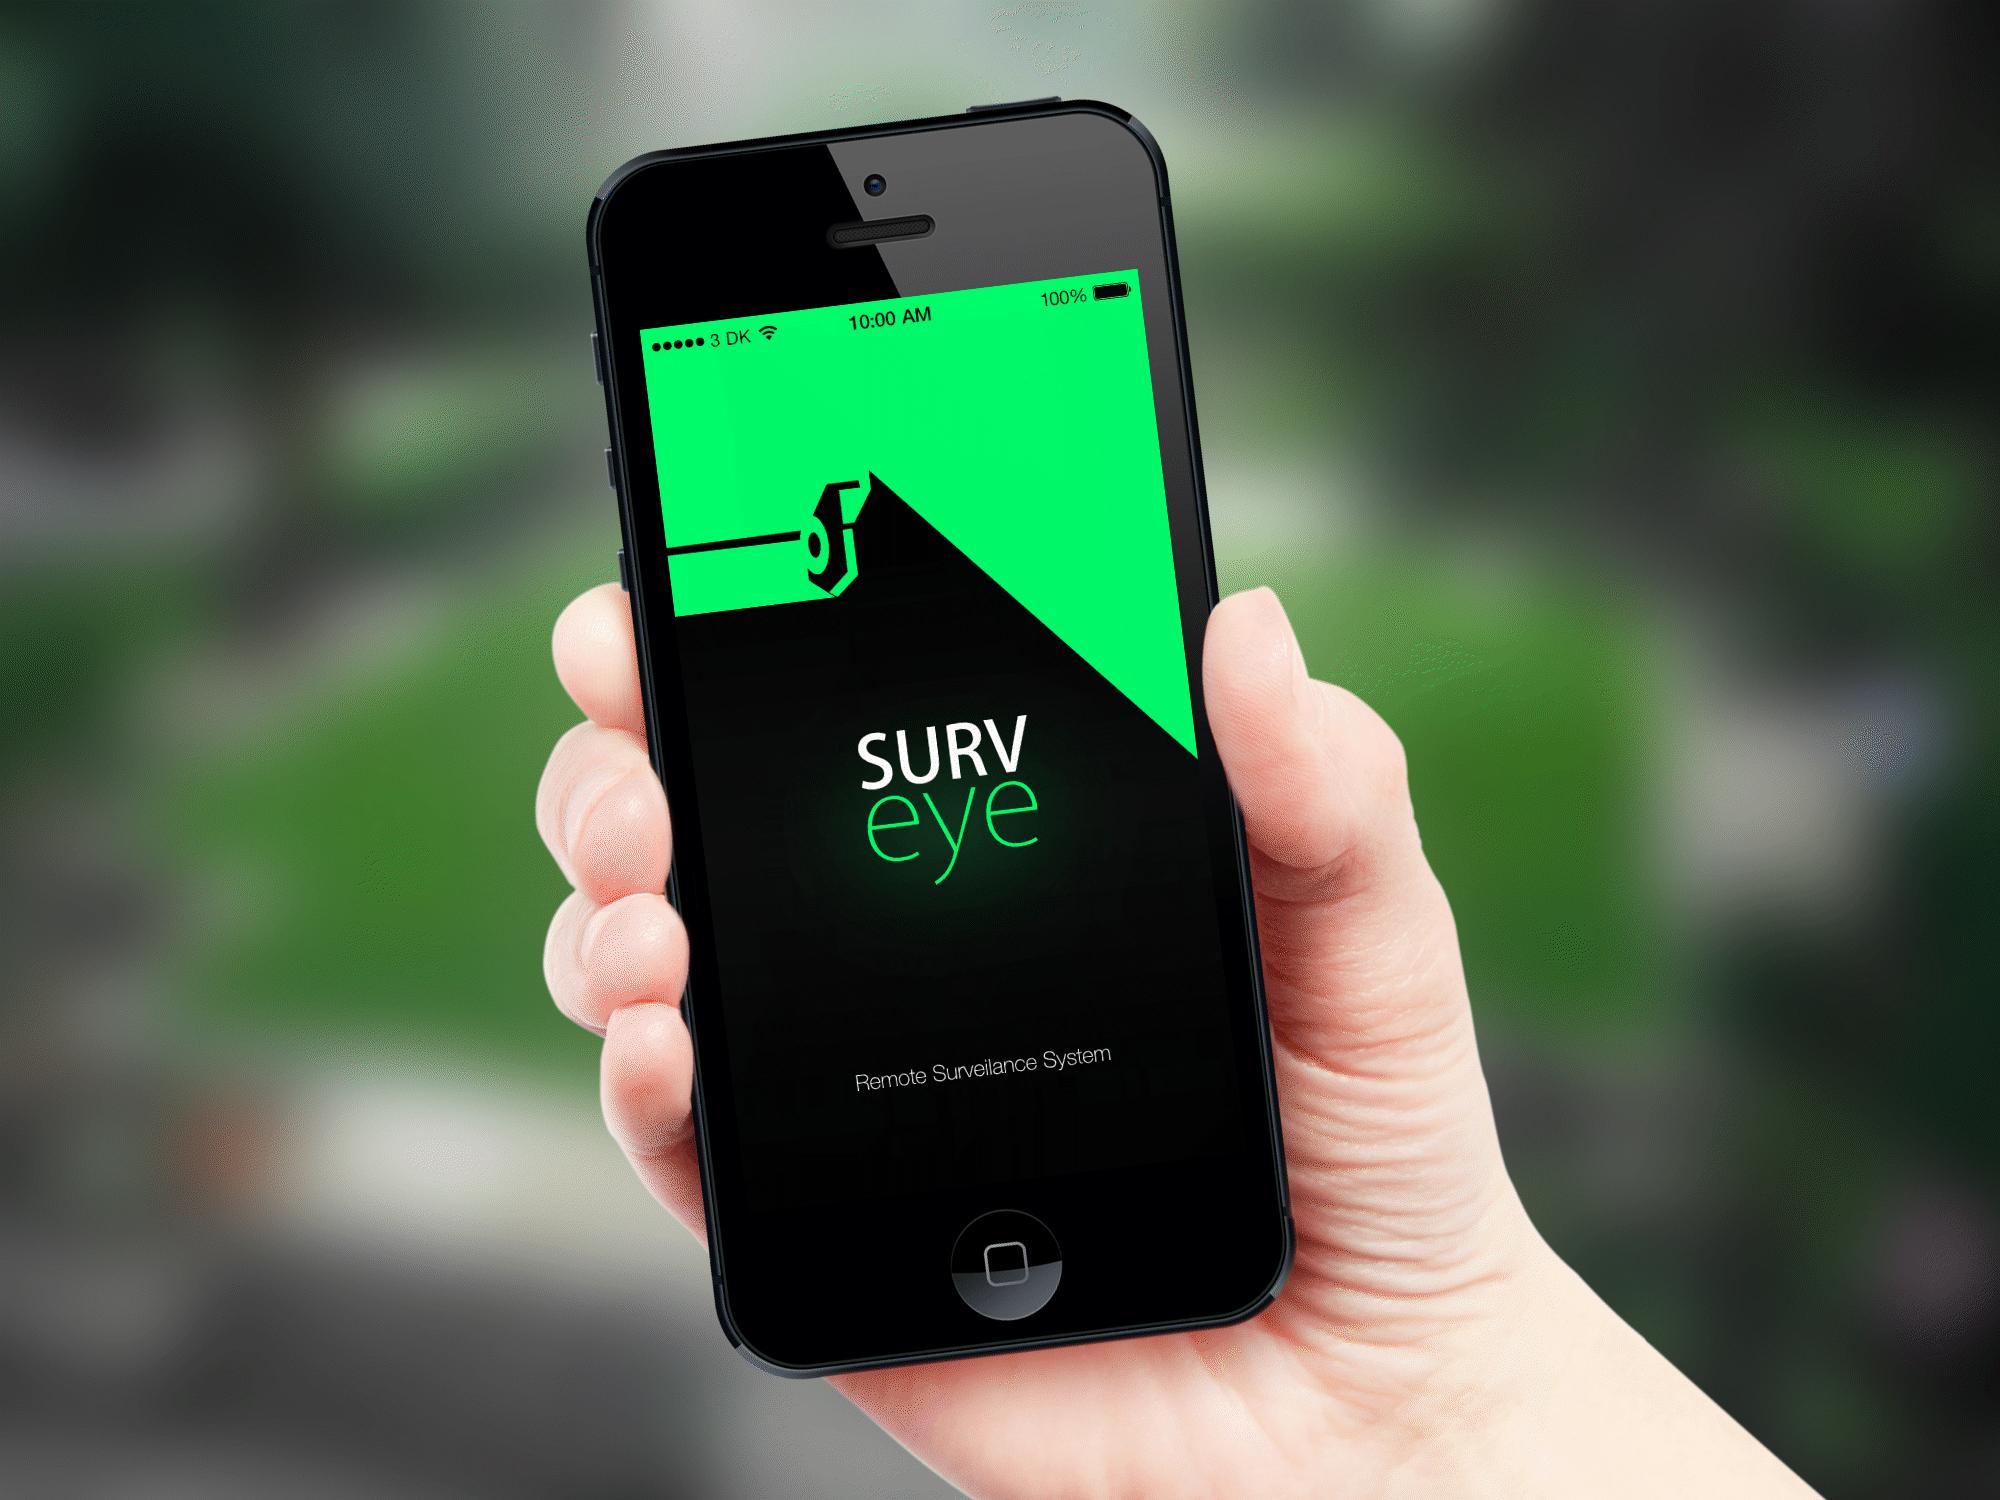 1-SURVeye-intro-screen